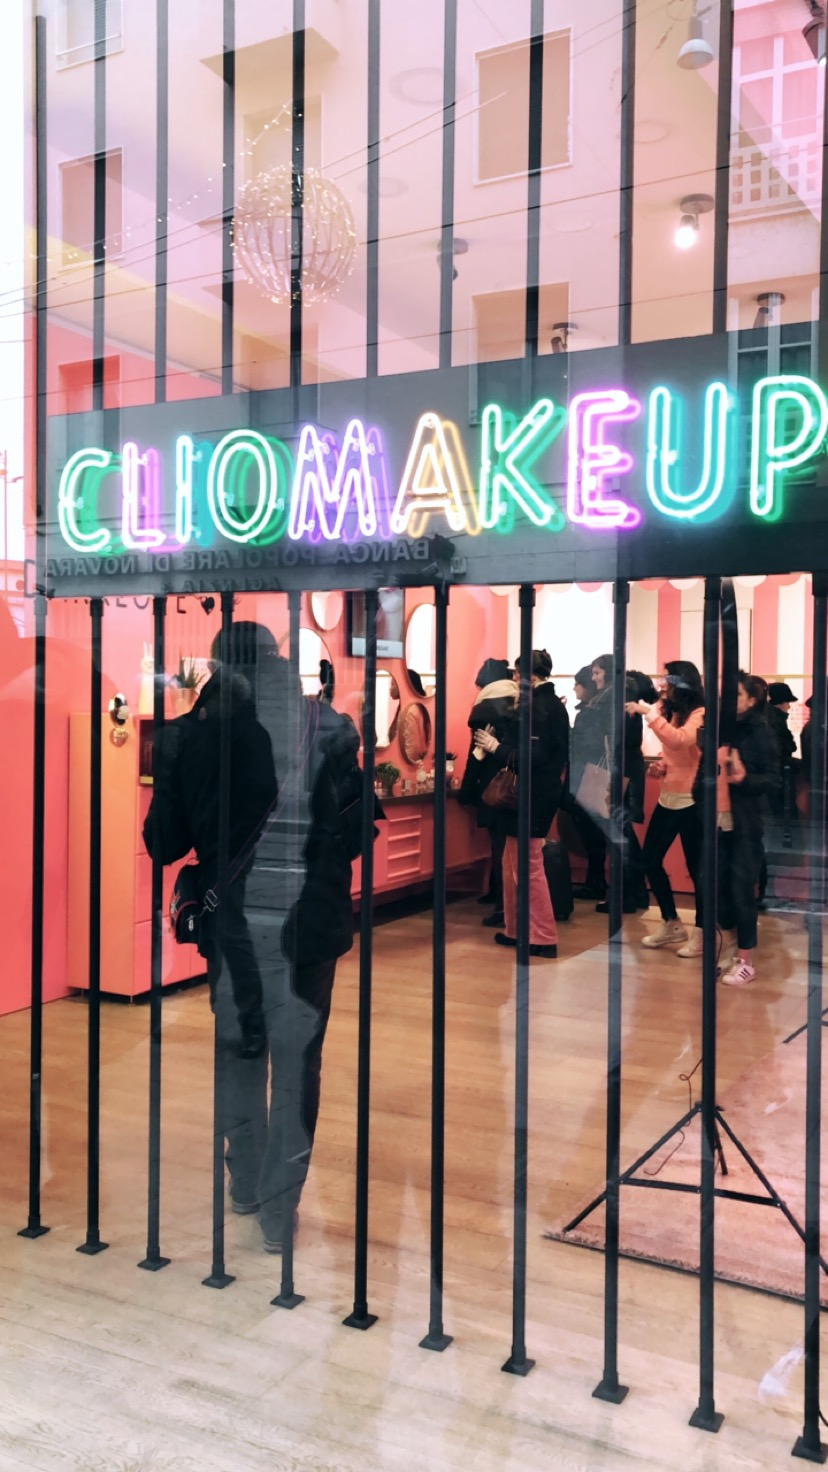 Clio Makeup Pop-up